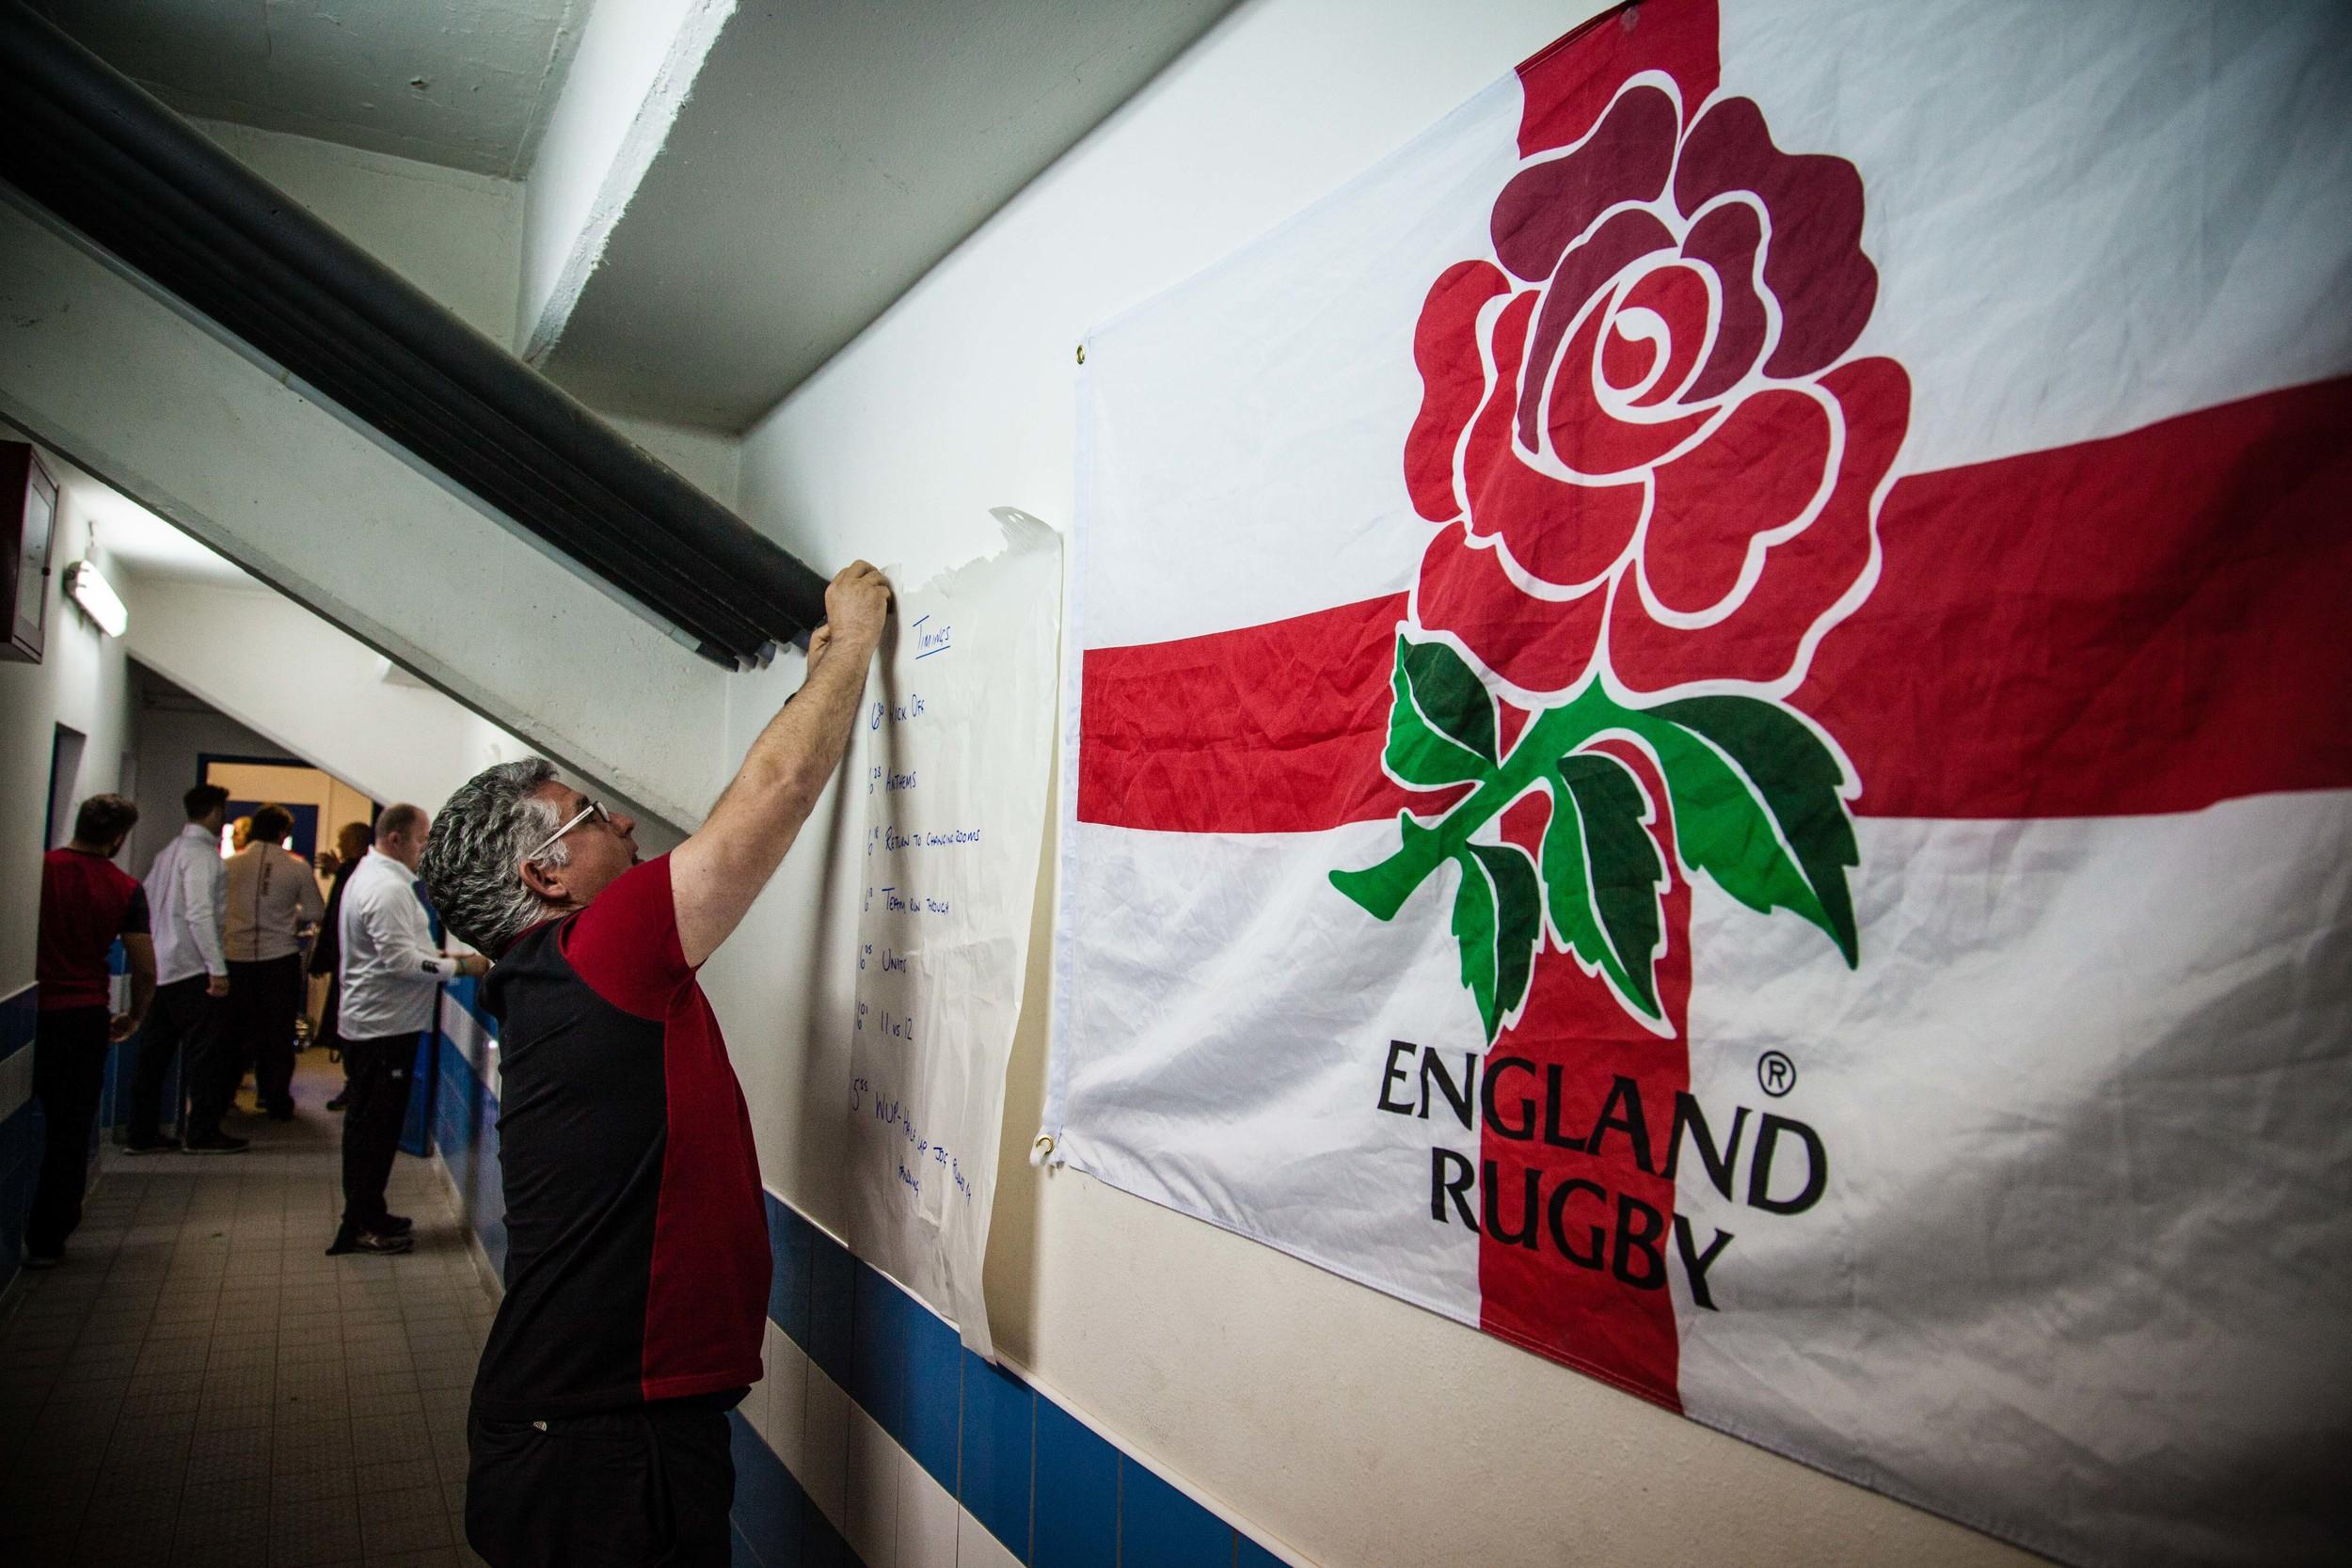 rugbyflag.jpg